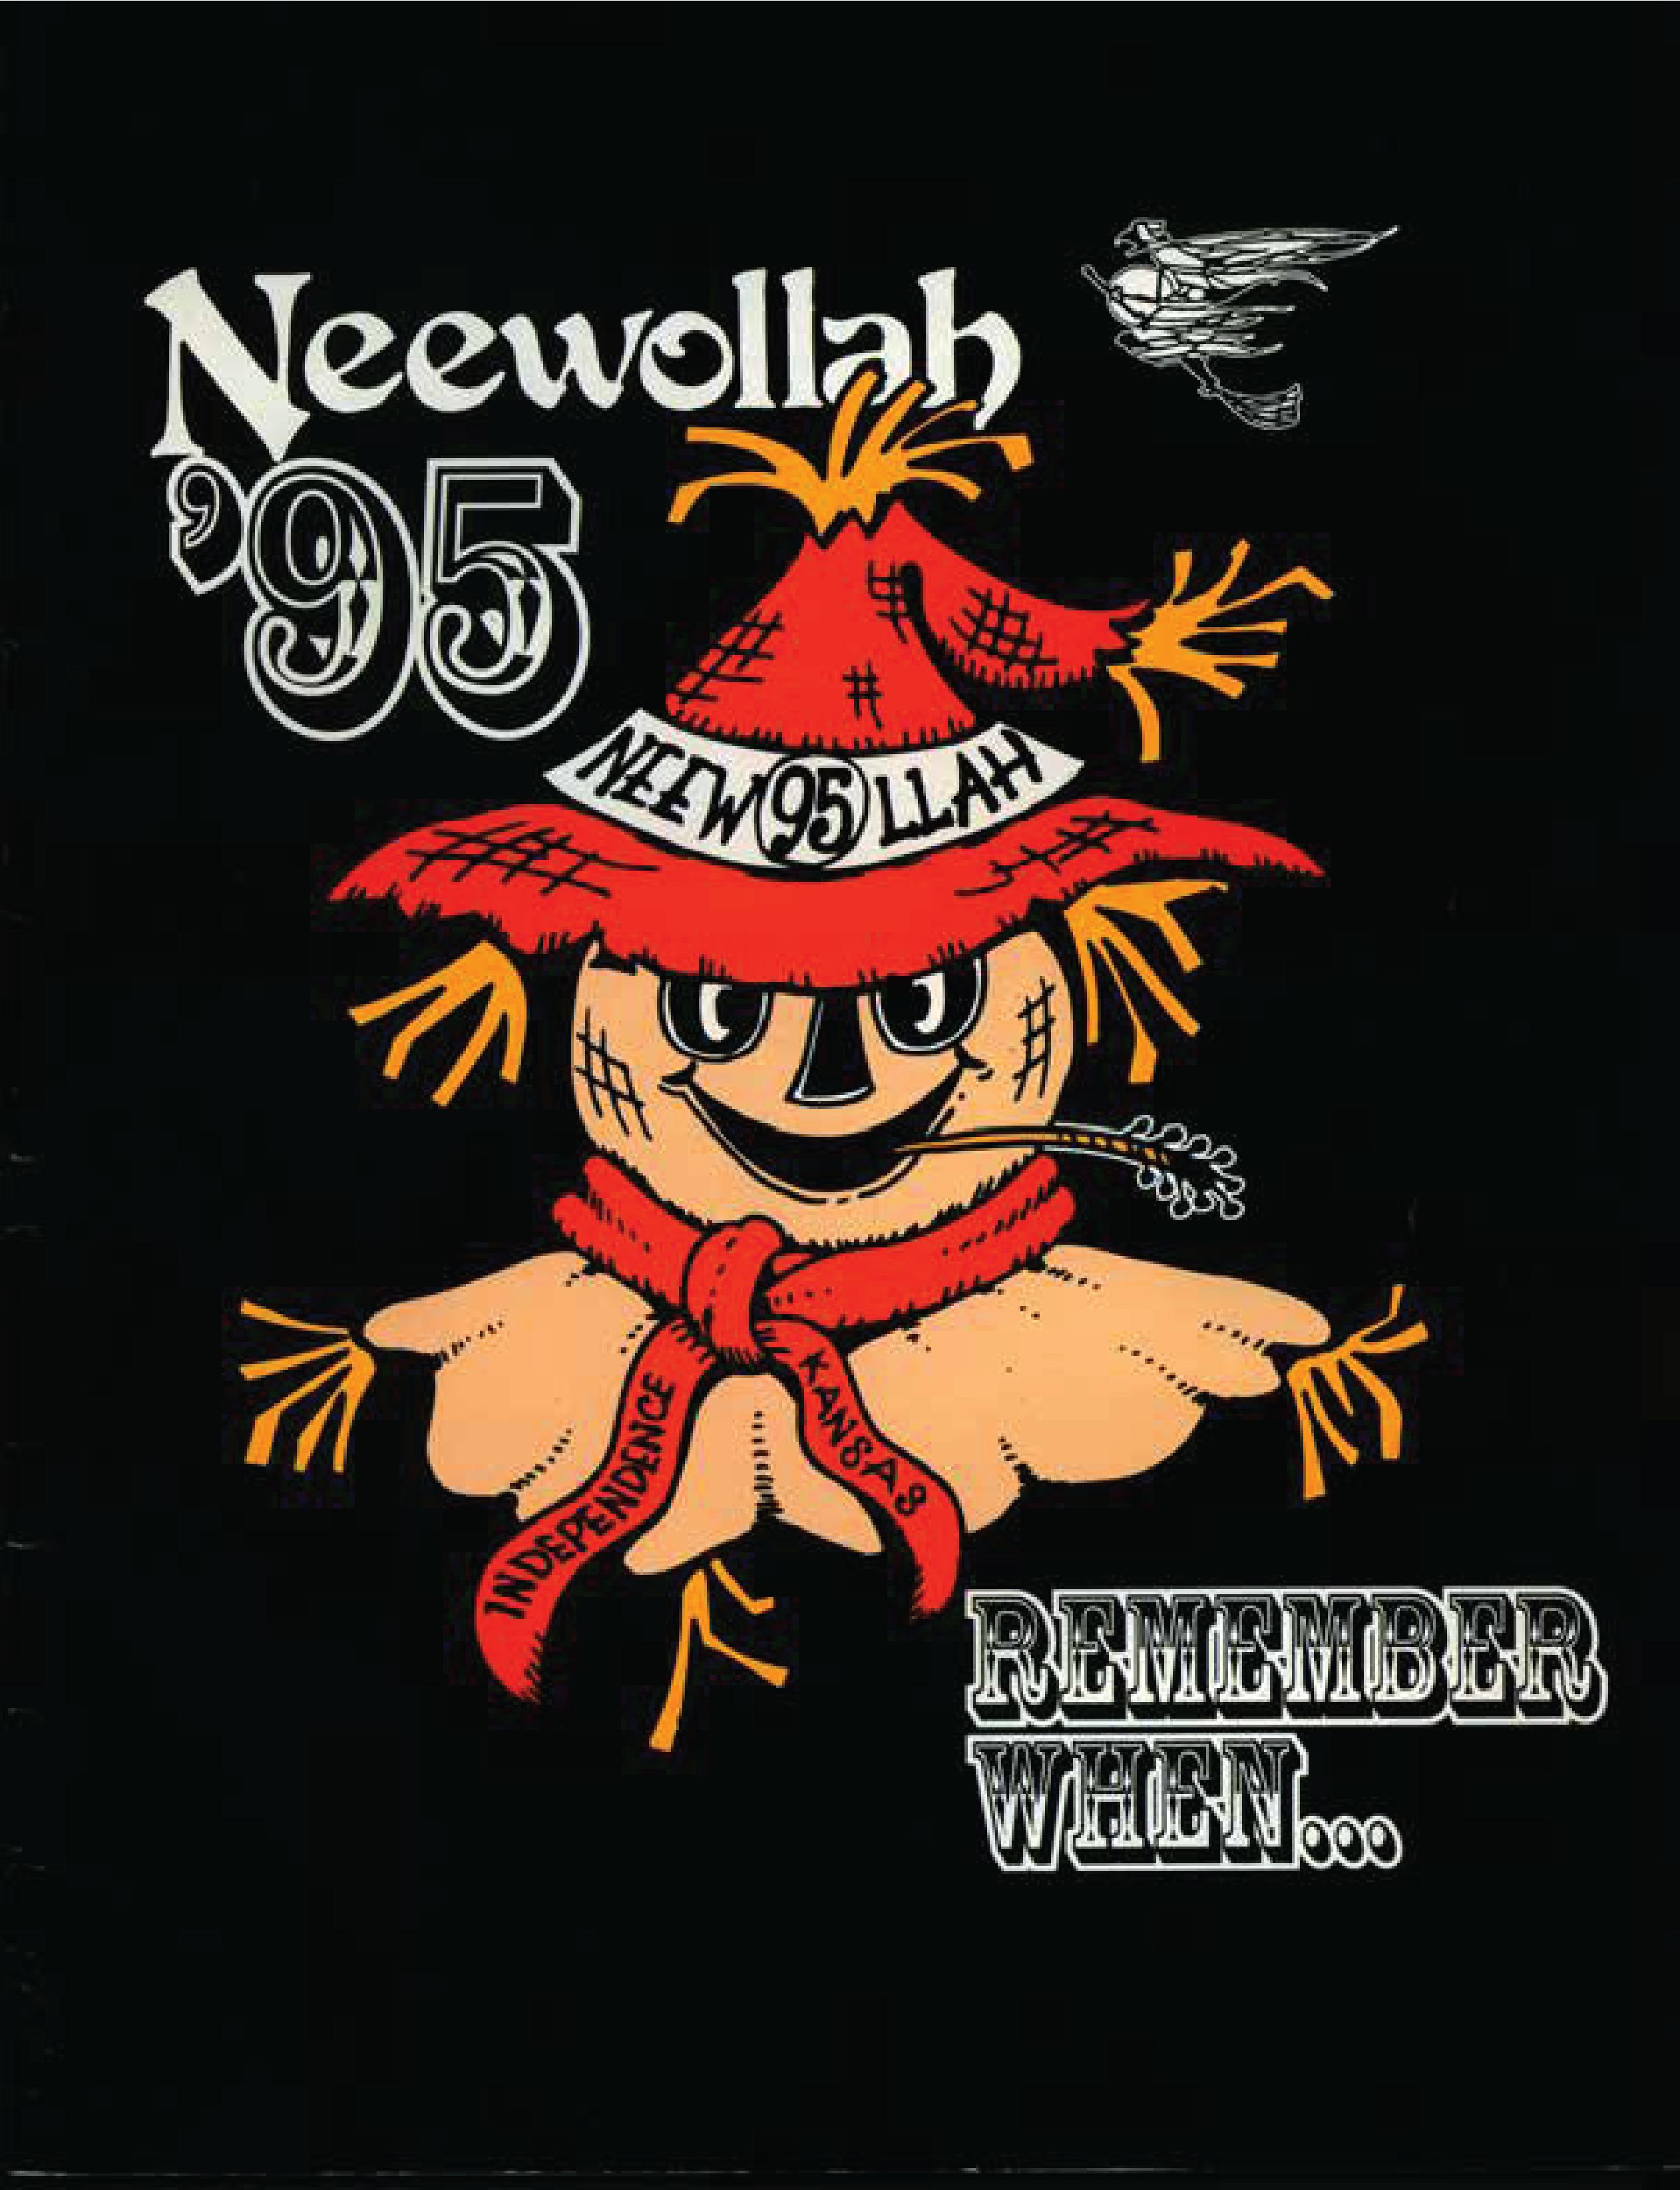 Neewollah 1995 Remember When